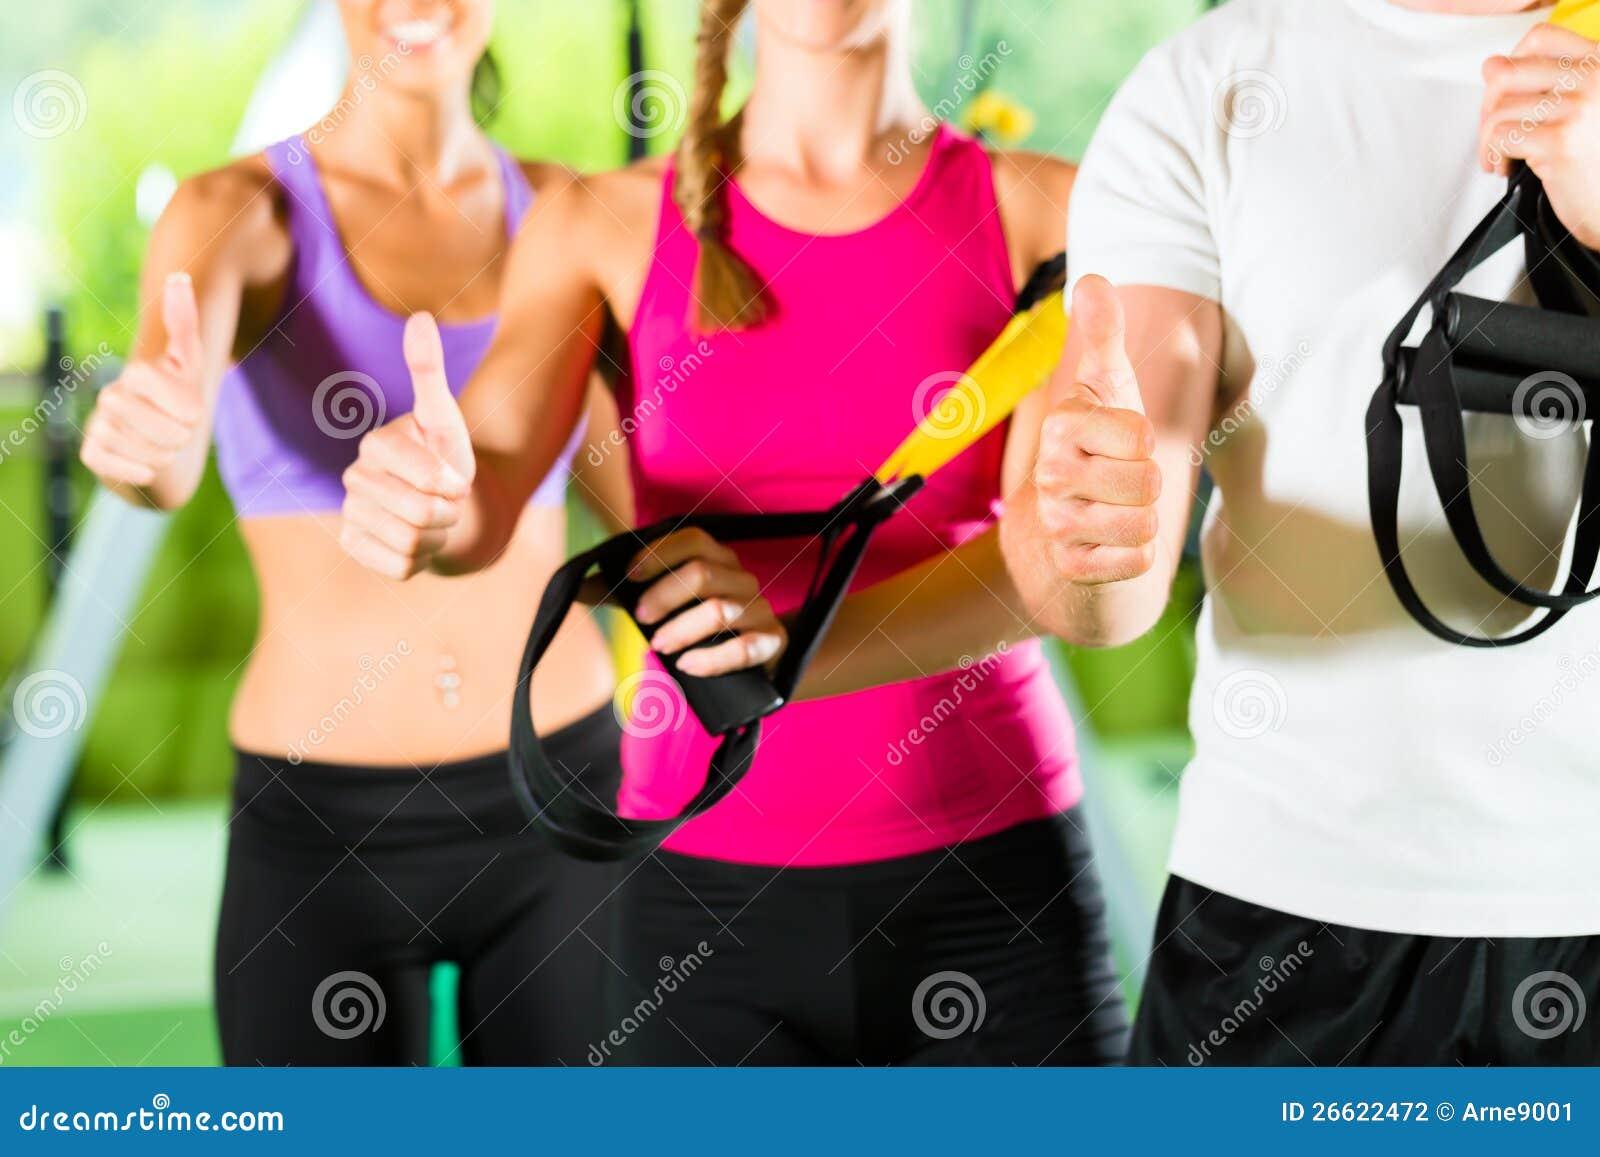 human machine athletic club